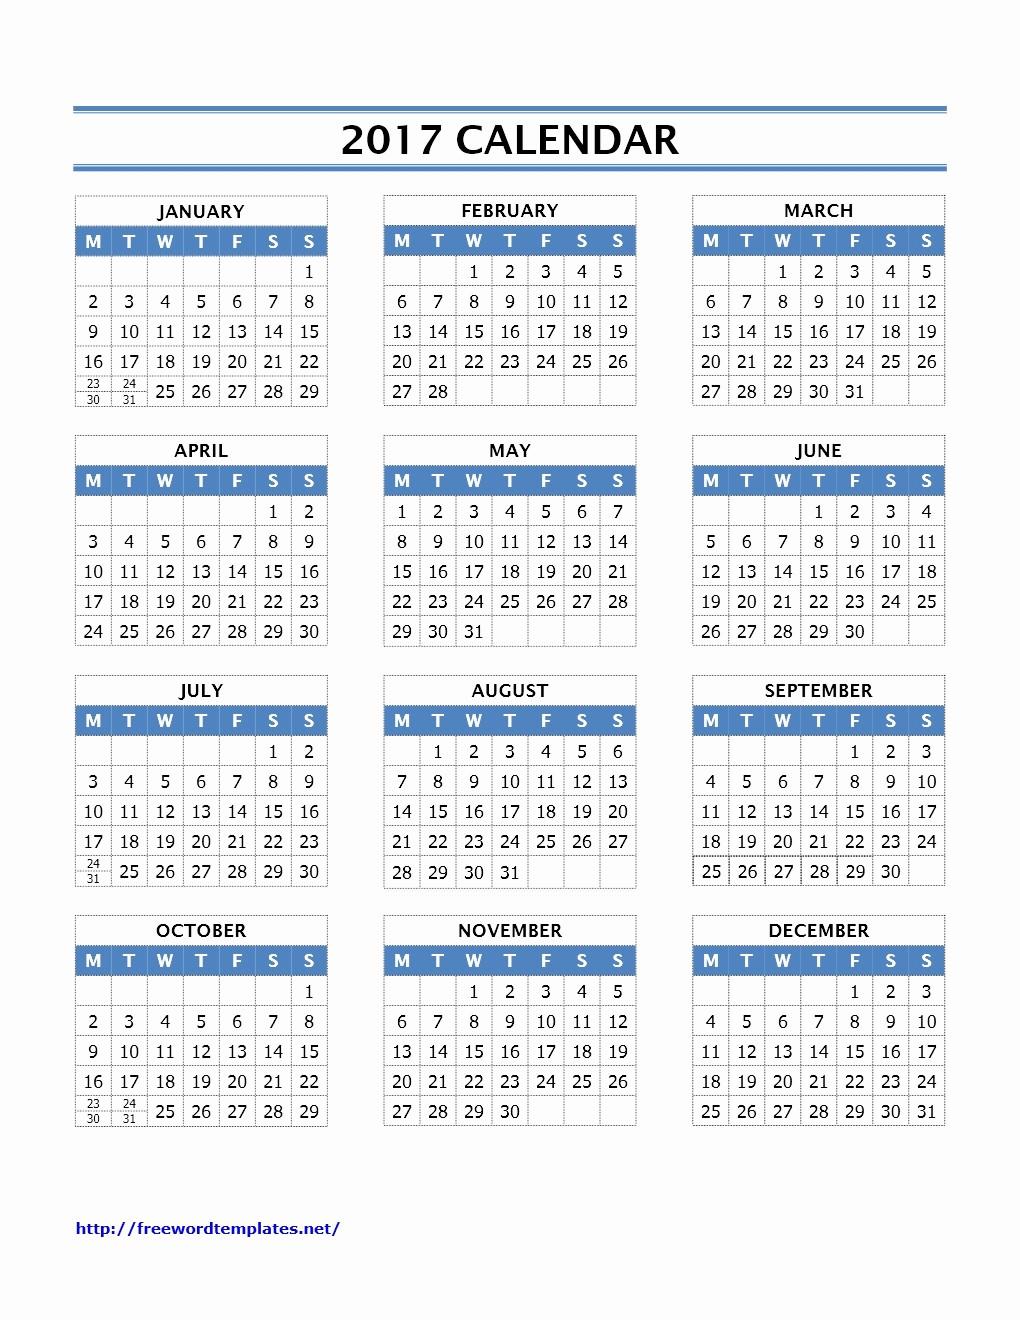 Microsoft Word Calendar Template 2018 Best Of Microsoft Office Calendar Template 2018 January 2018